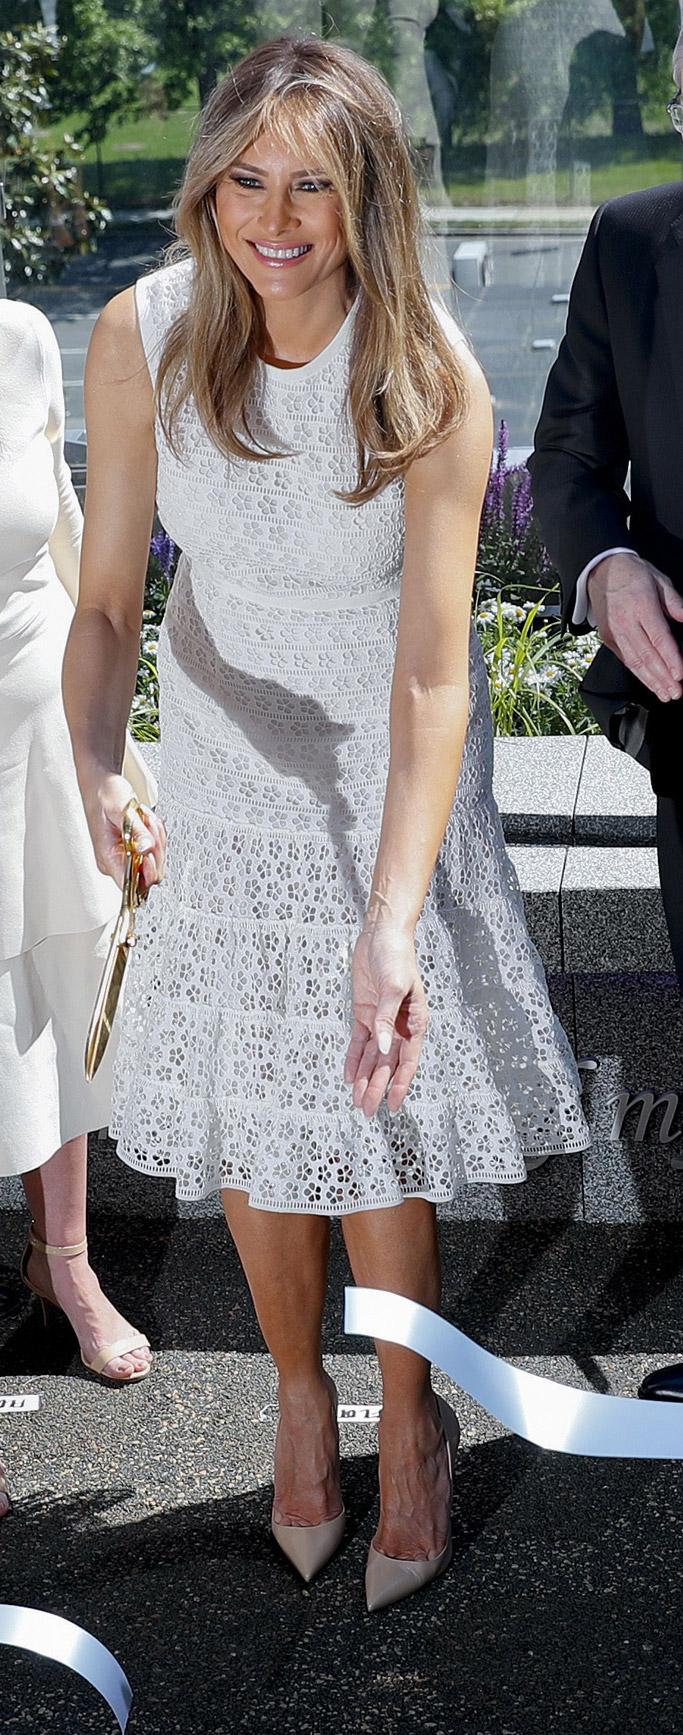 melania trump nude shoes news 2017 dress first lady children's national hospital style christian louboutin Giambattista Valli